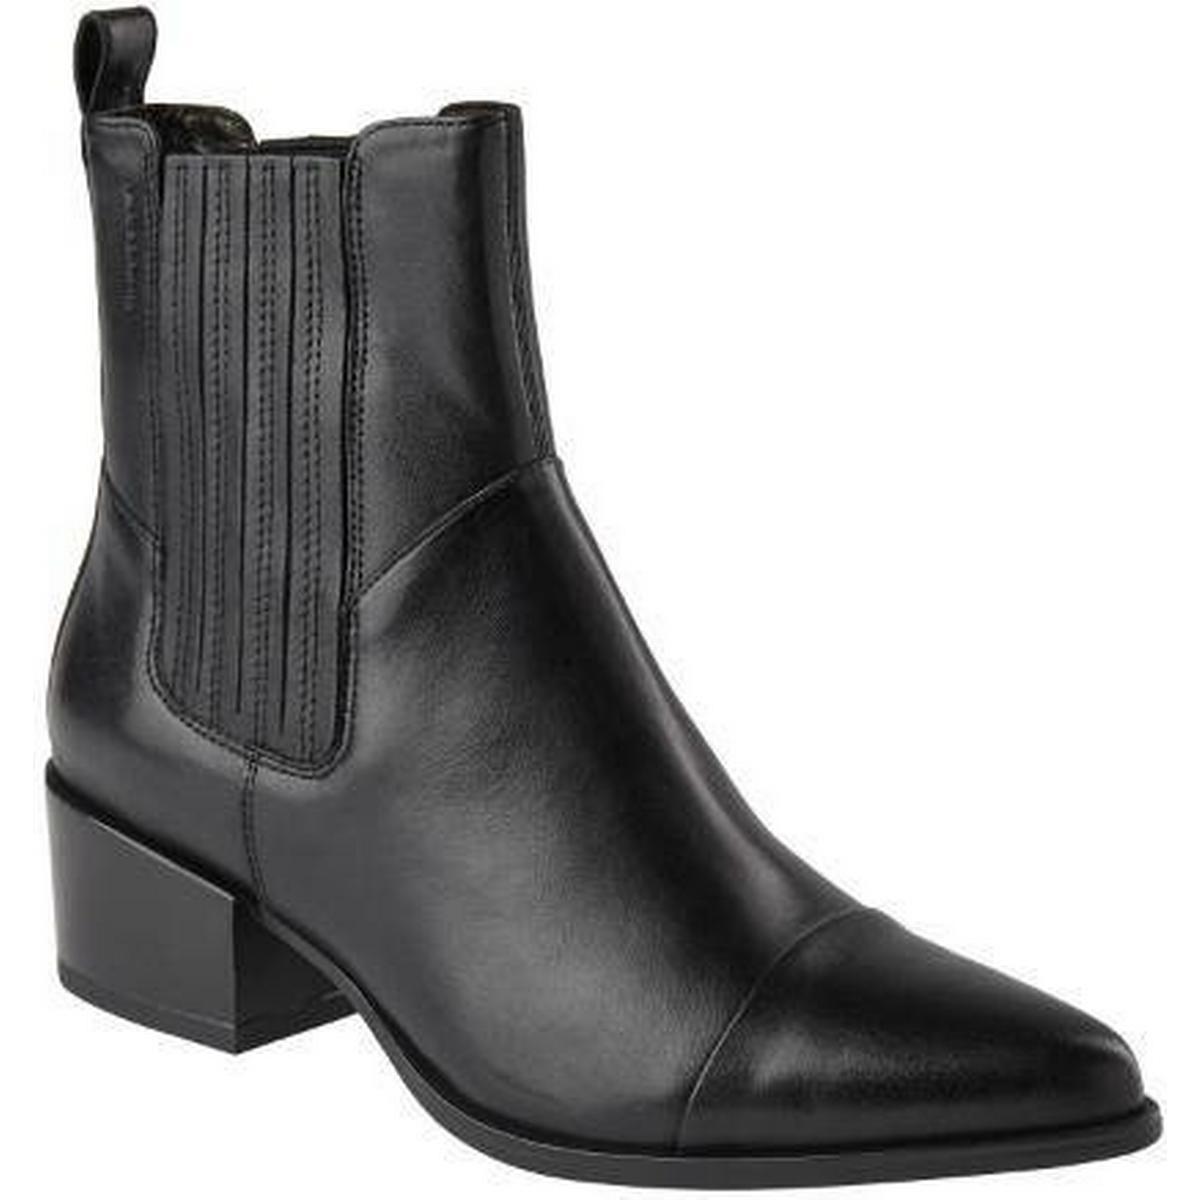 vagabond grace boots nubuck, Vagabond HUSTLE Støvletter